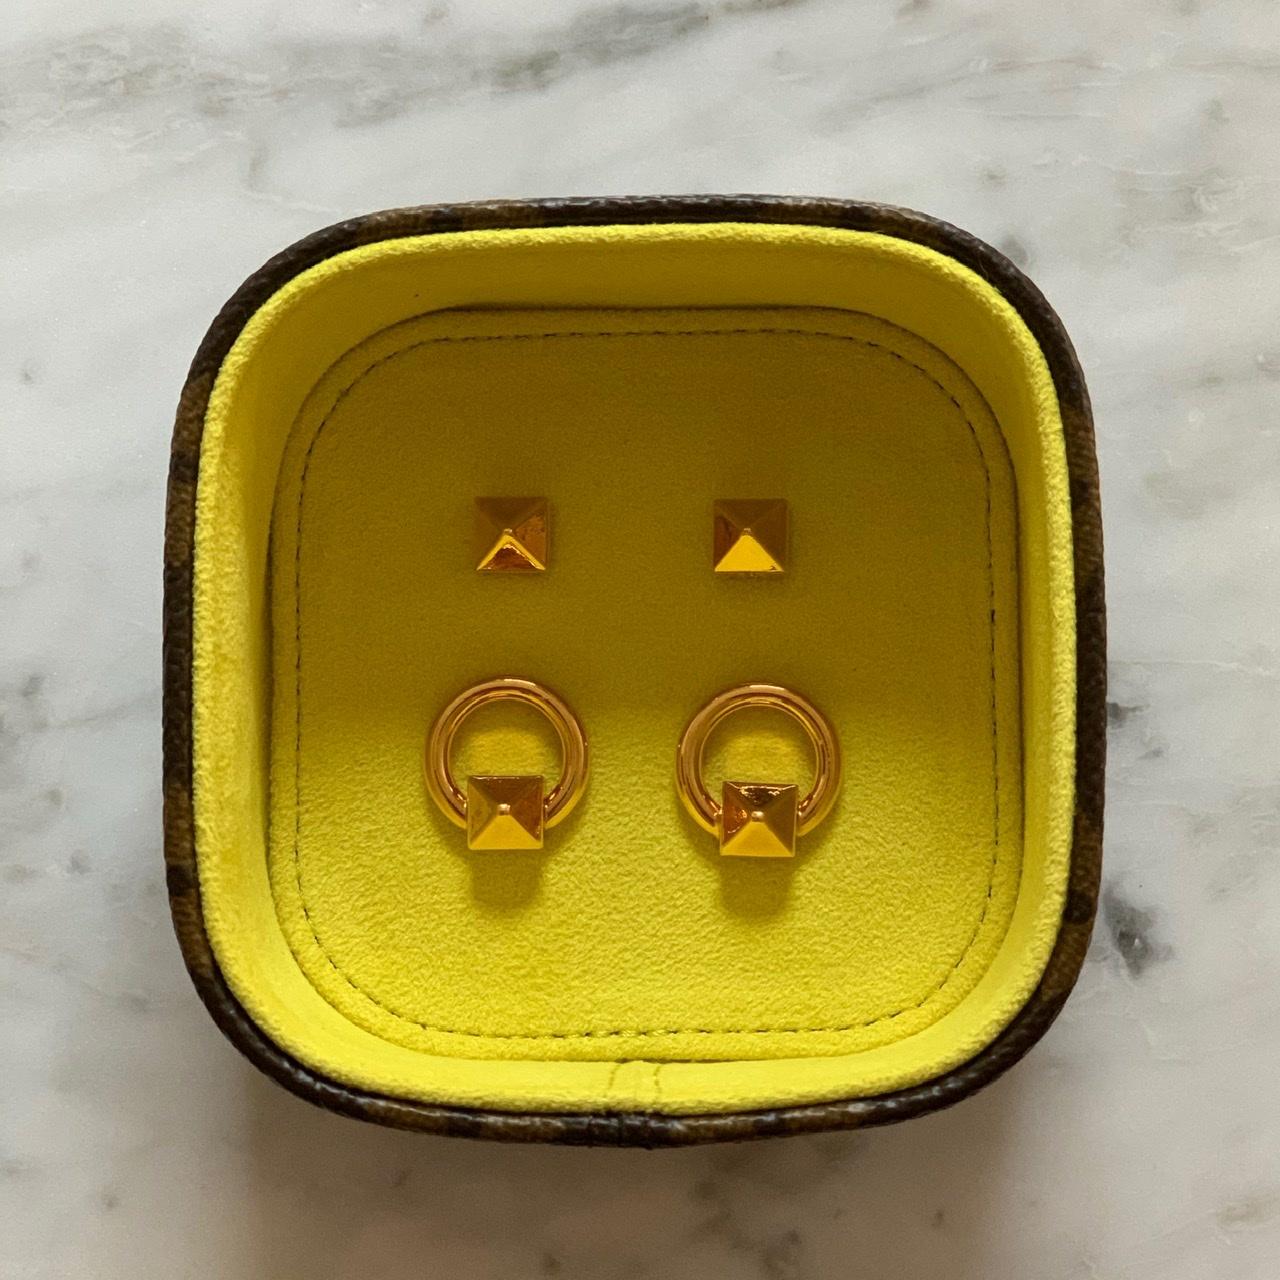 VALENTINOのイヤリング